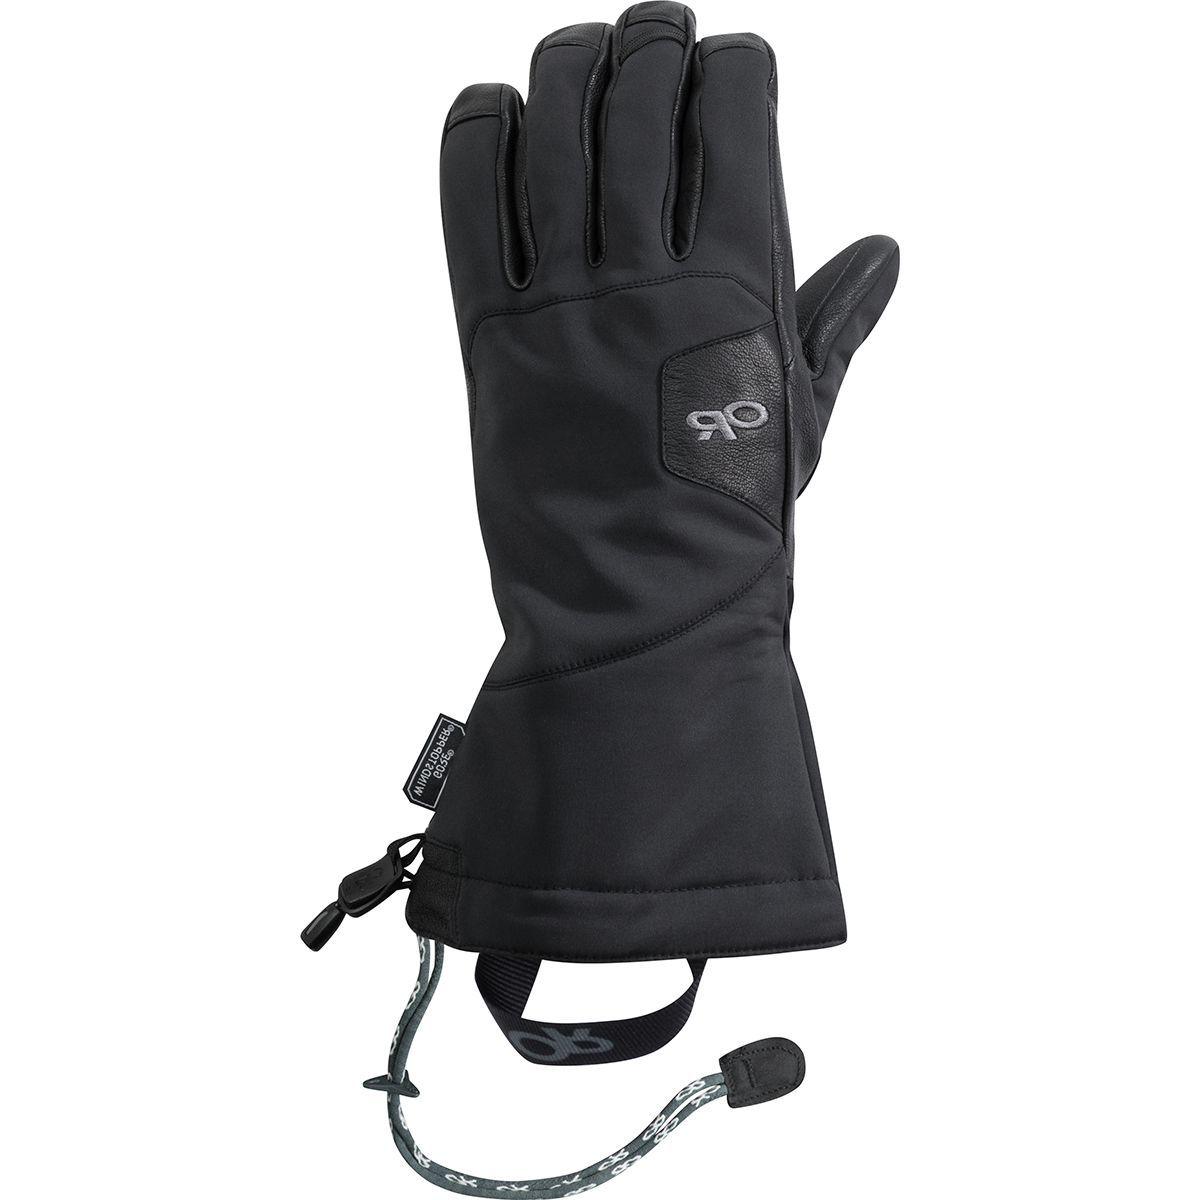 Outdoor Research Luminary Sensor Glove - Men's